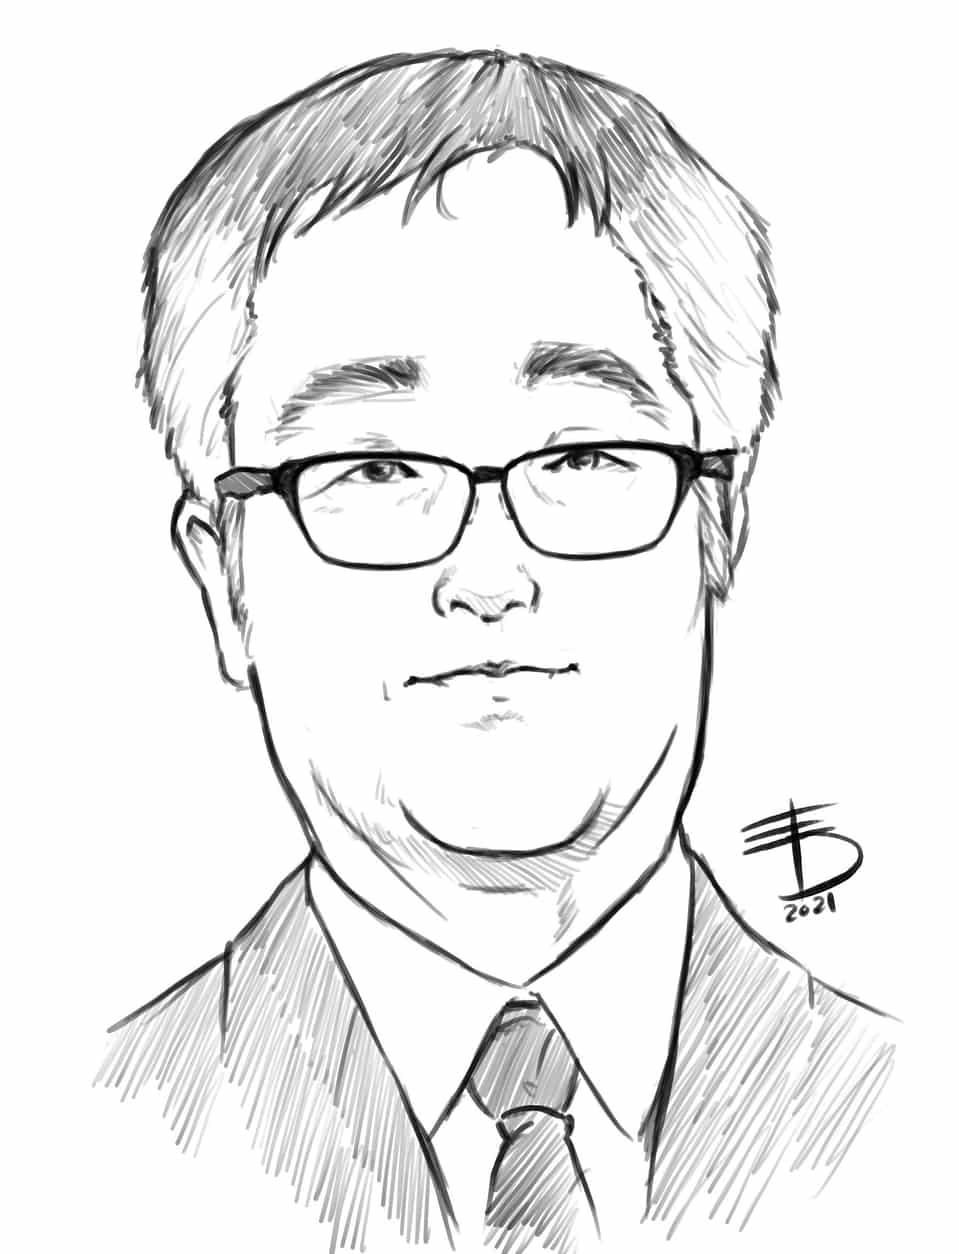 Katsuhiro Otomo Sensei  Illust of Derwelt art AKIRA drawing portrait medibangpaint anime illustration Artwork medibang manga